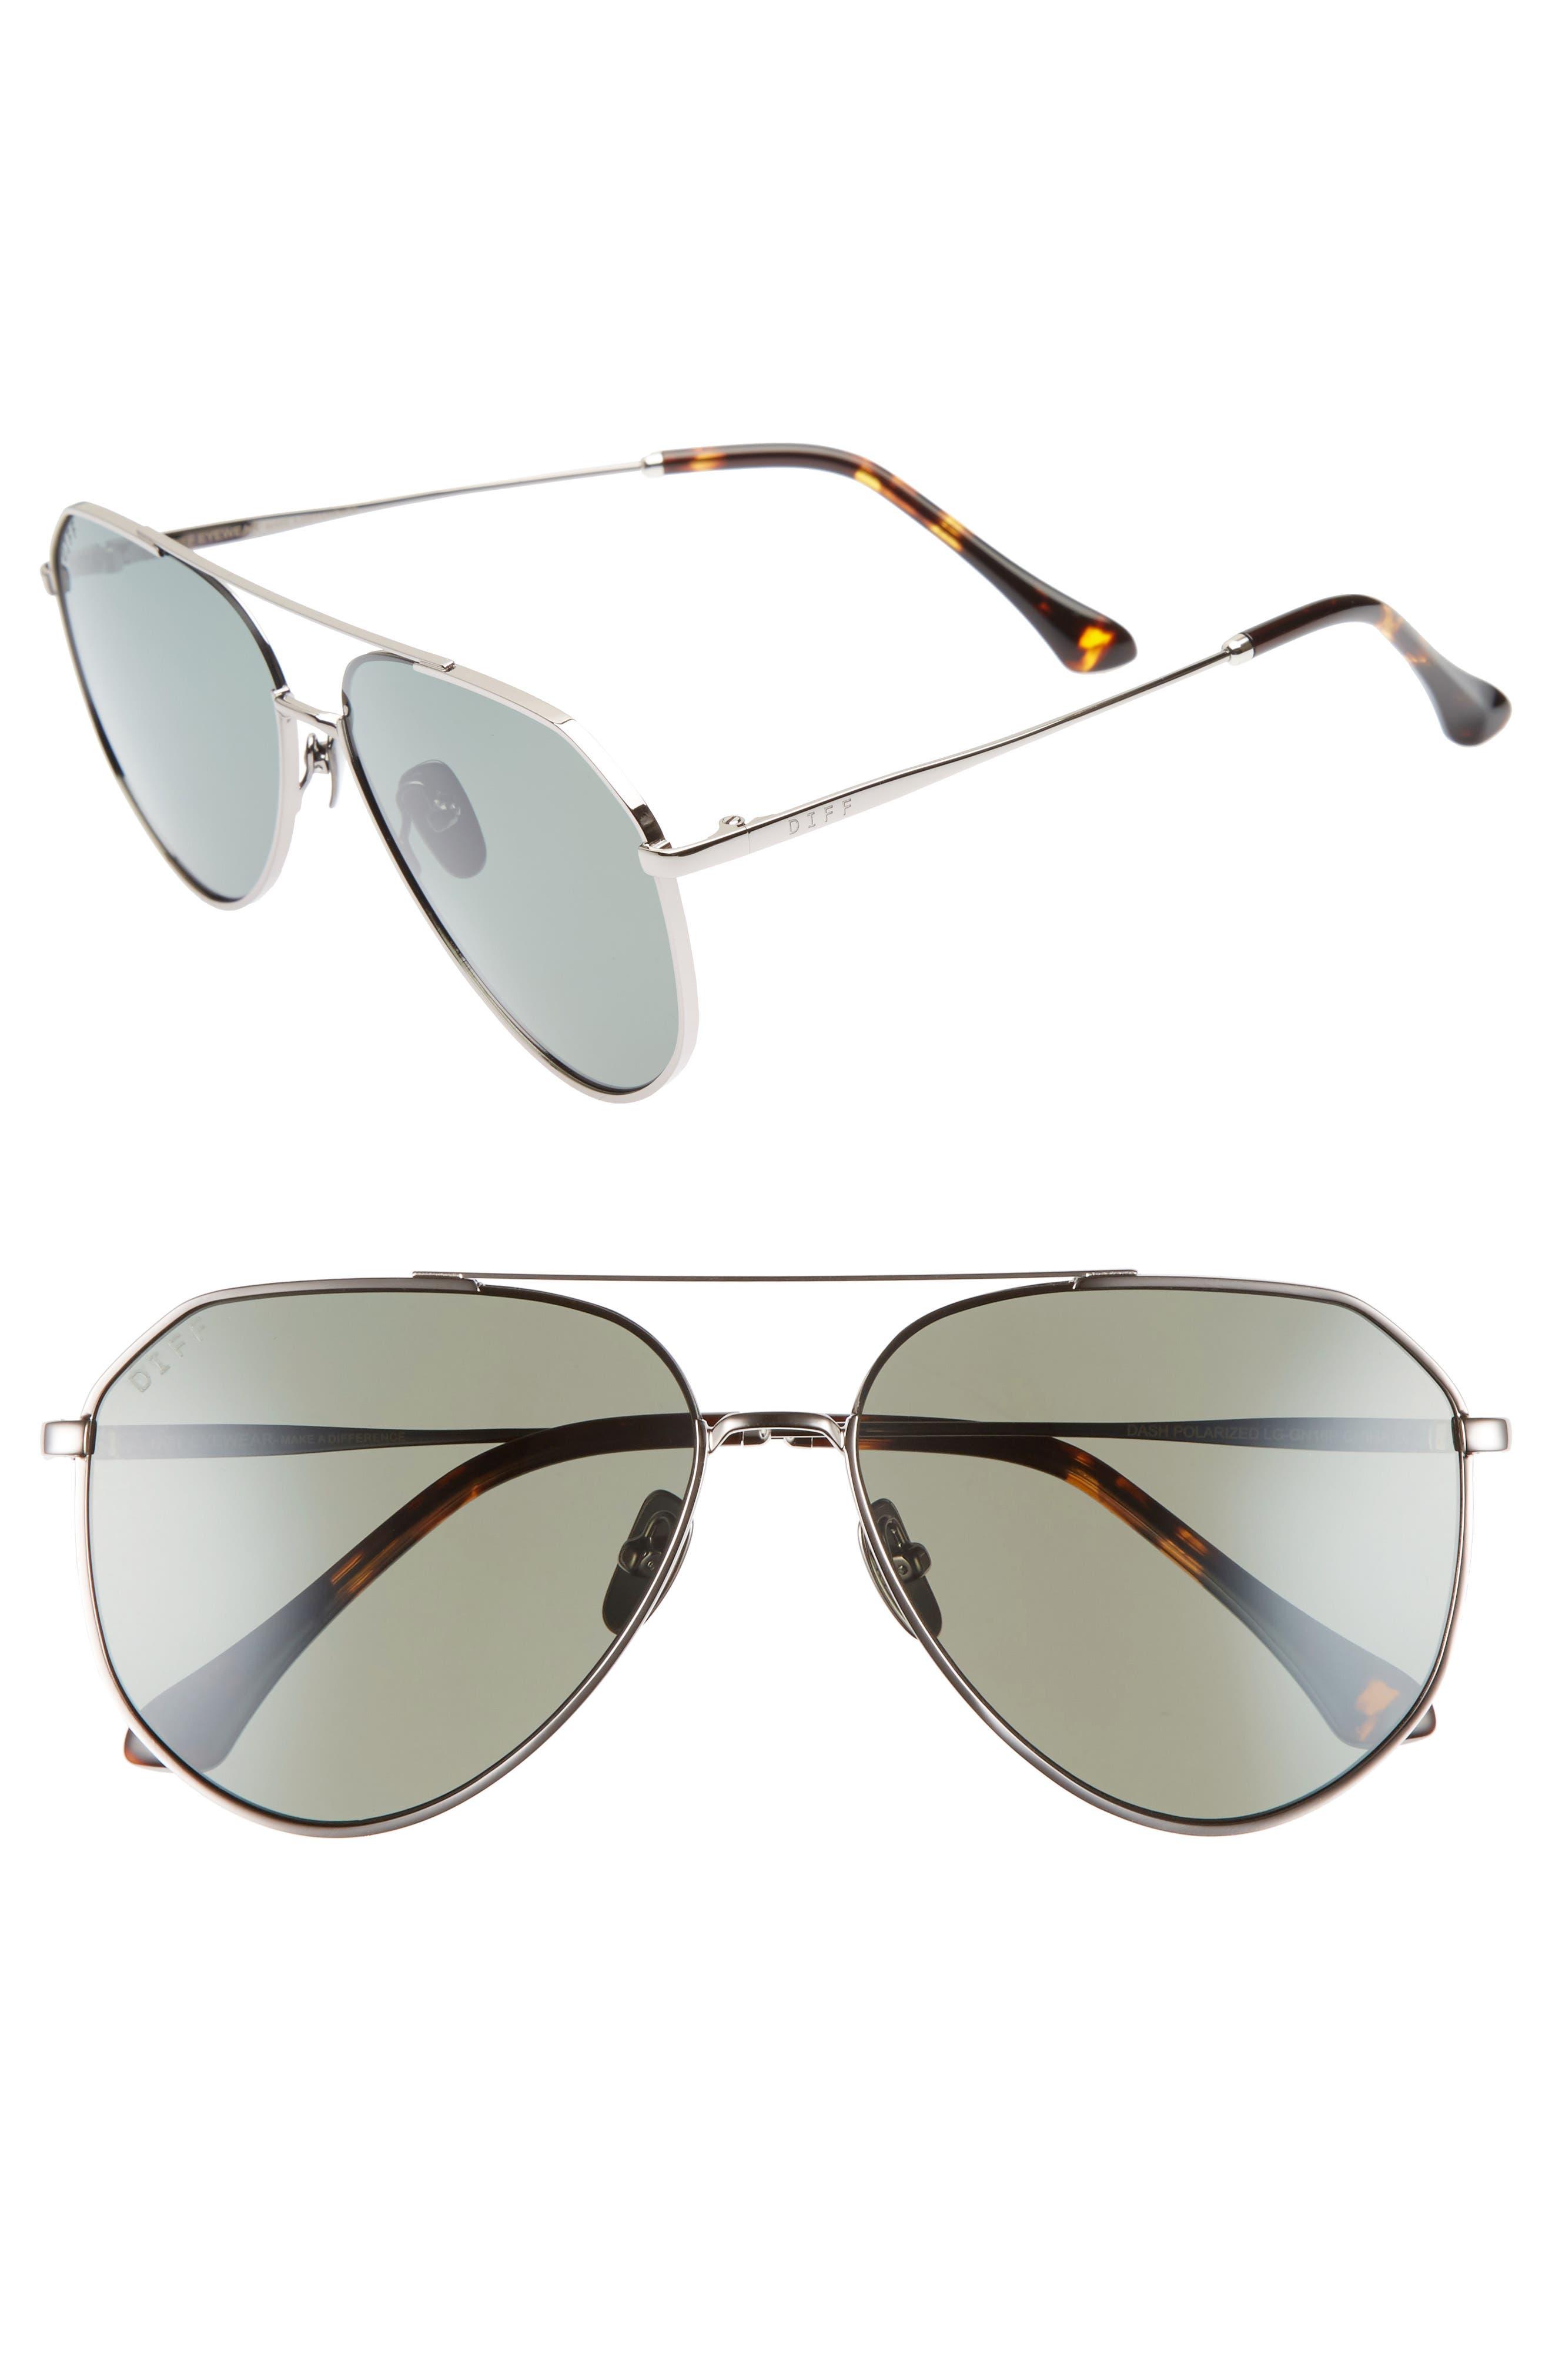 DIFF Dash 58mm Aviator Sunglasses